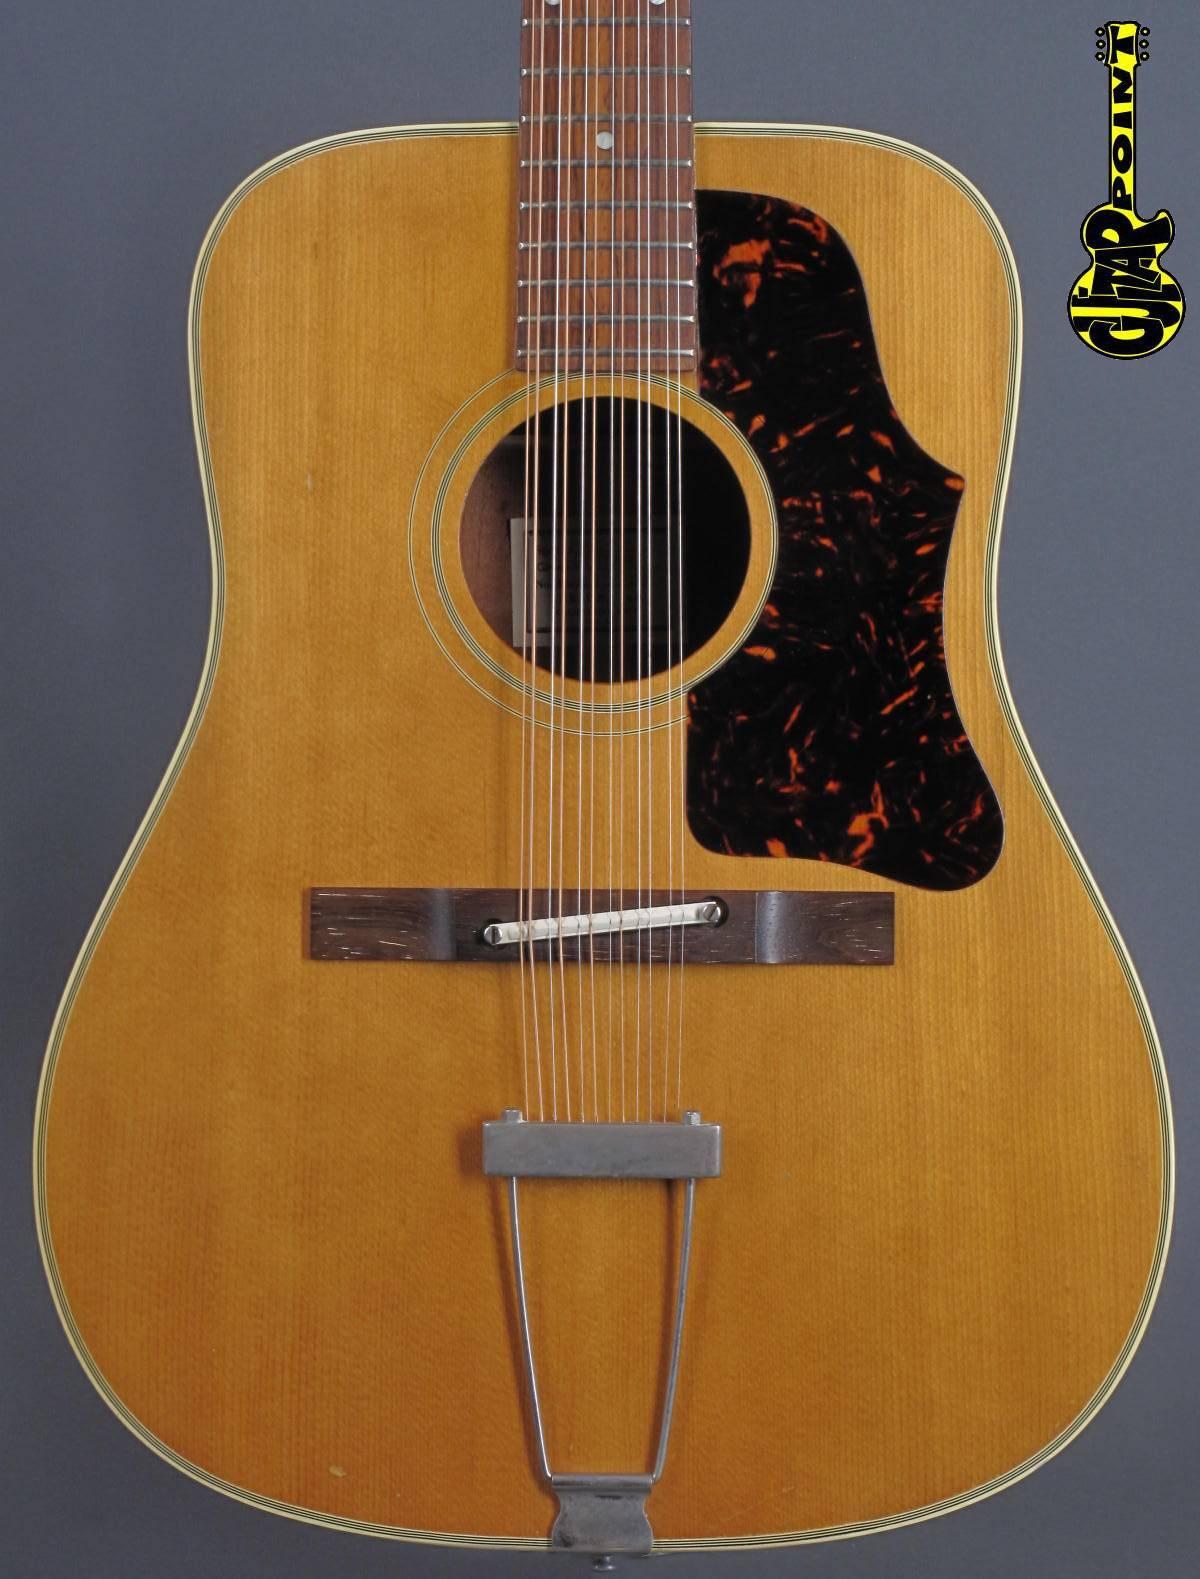 1963 Gibson B-45 12-string - Natural